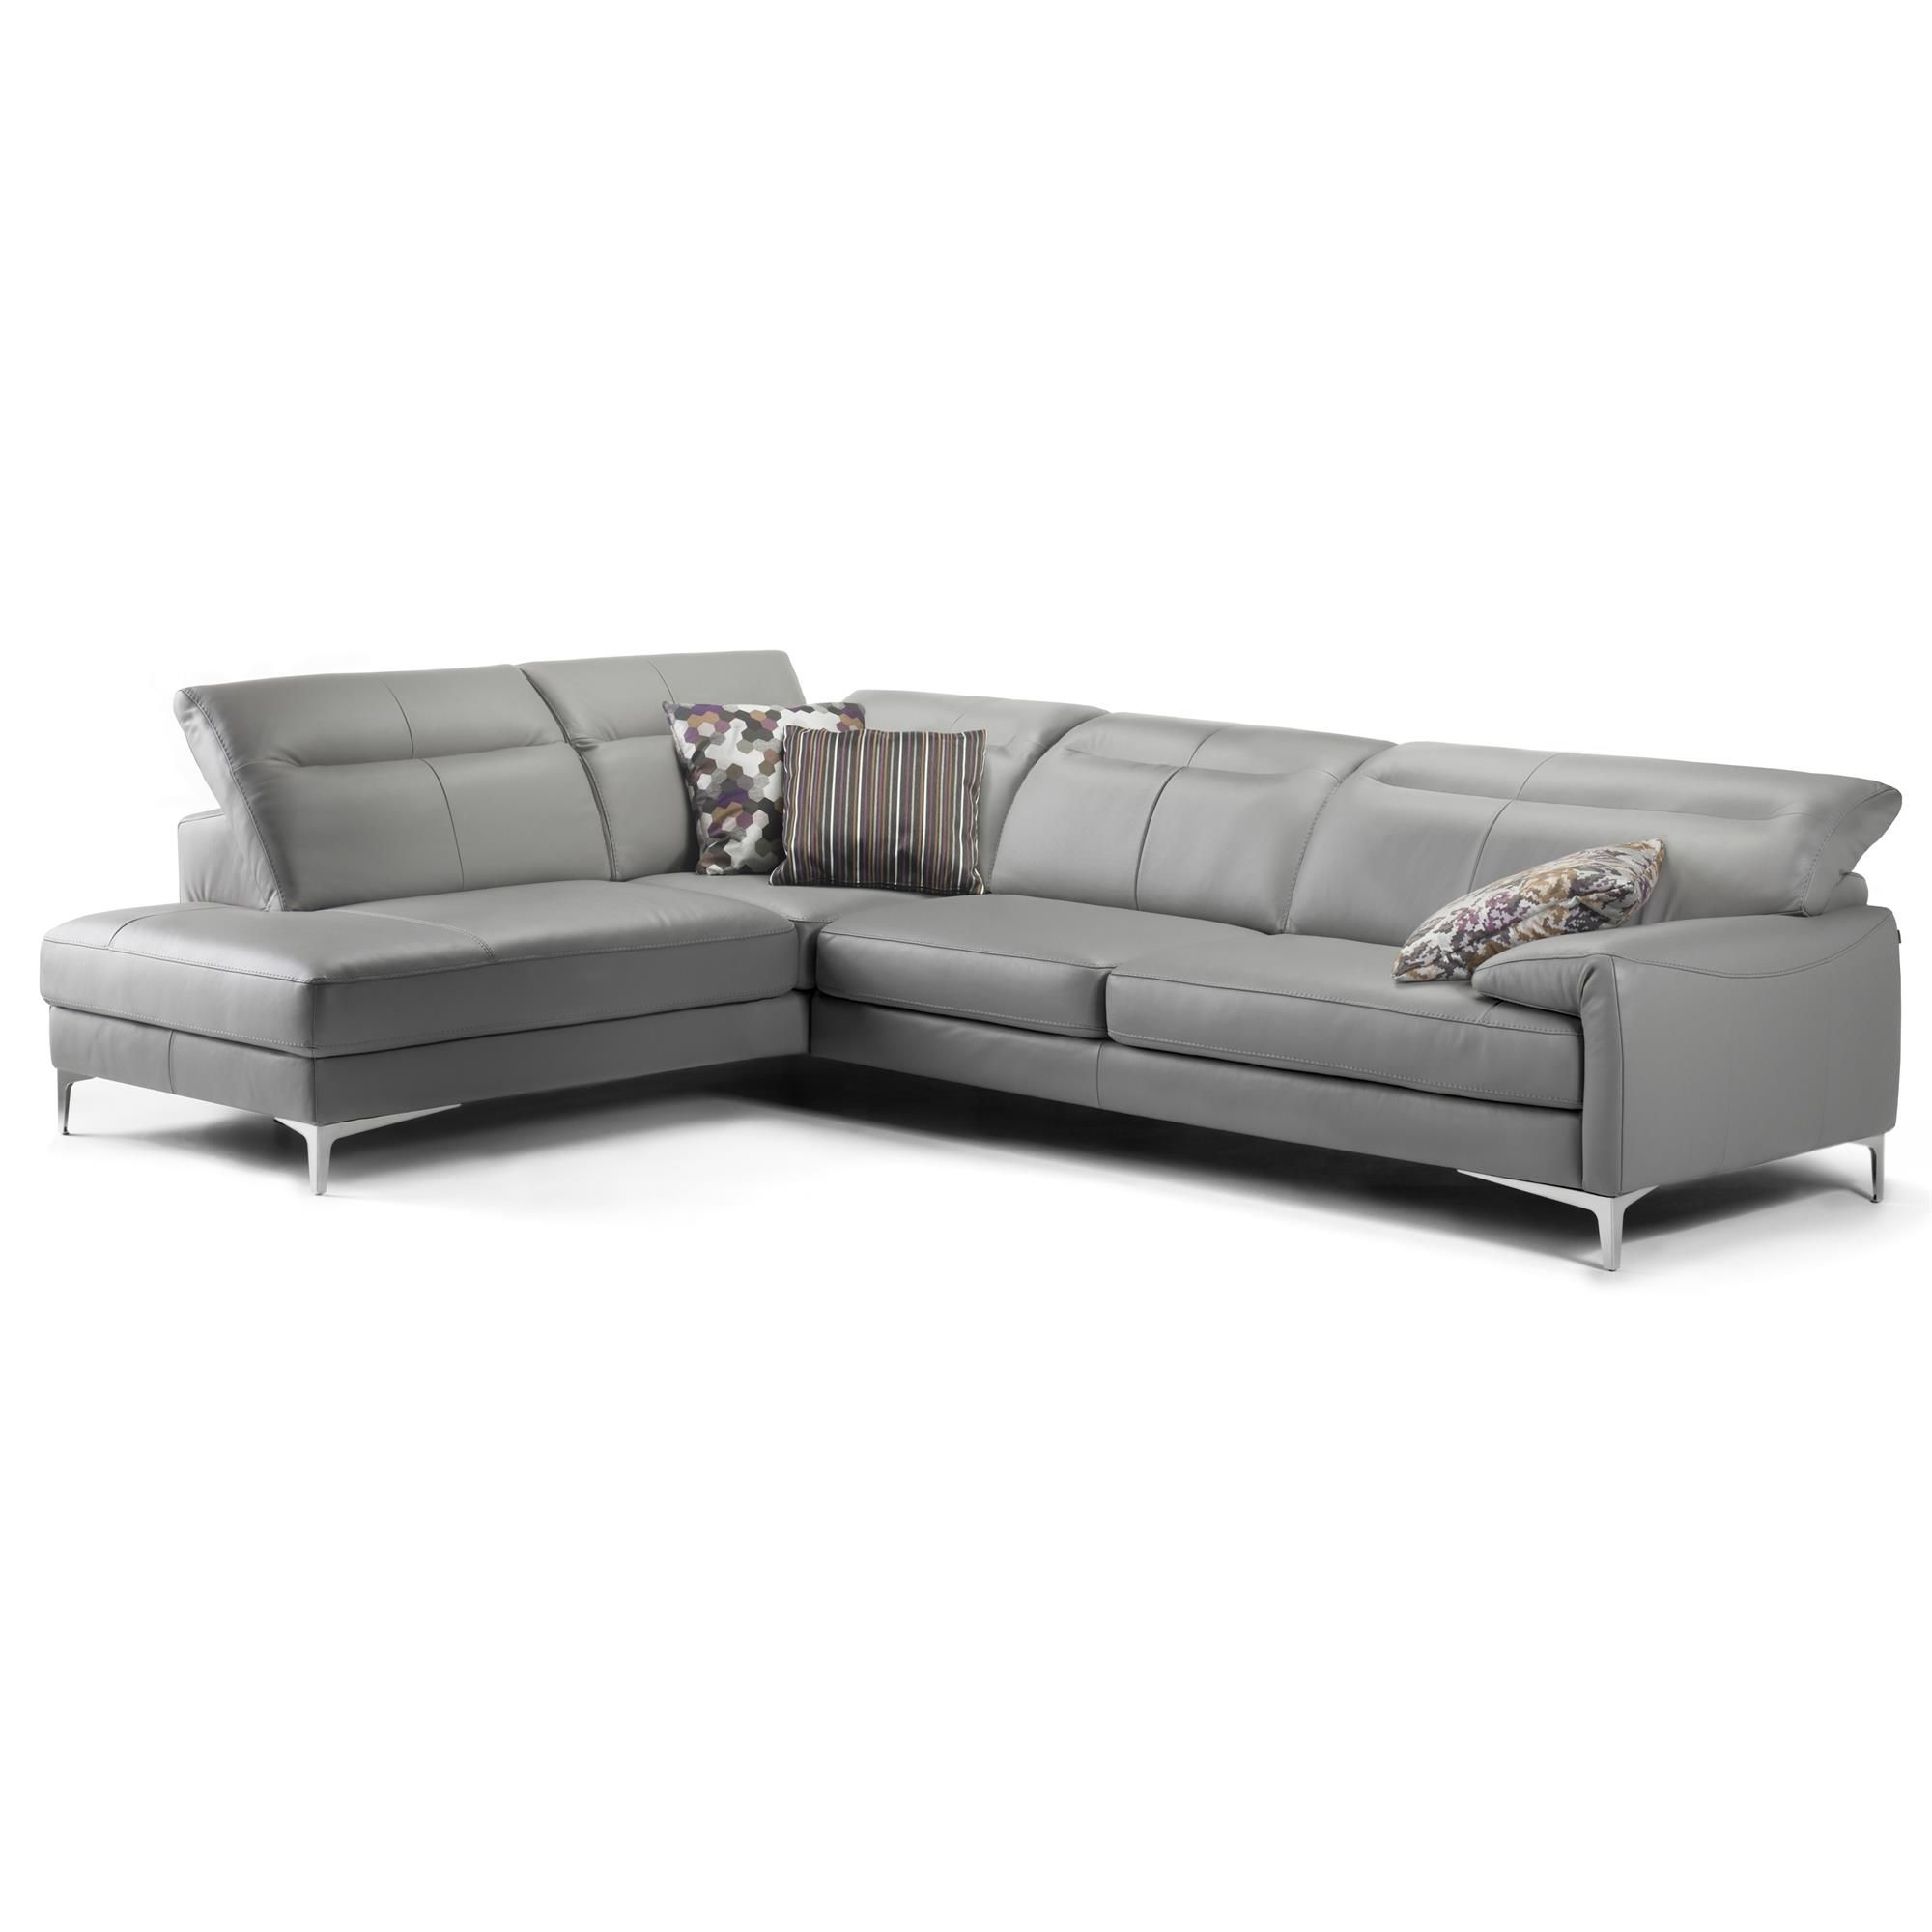 ROM Aruba Leather Corner Sofas from Queenstreet Carpets